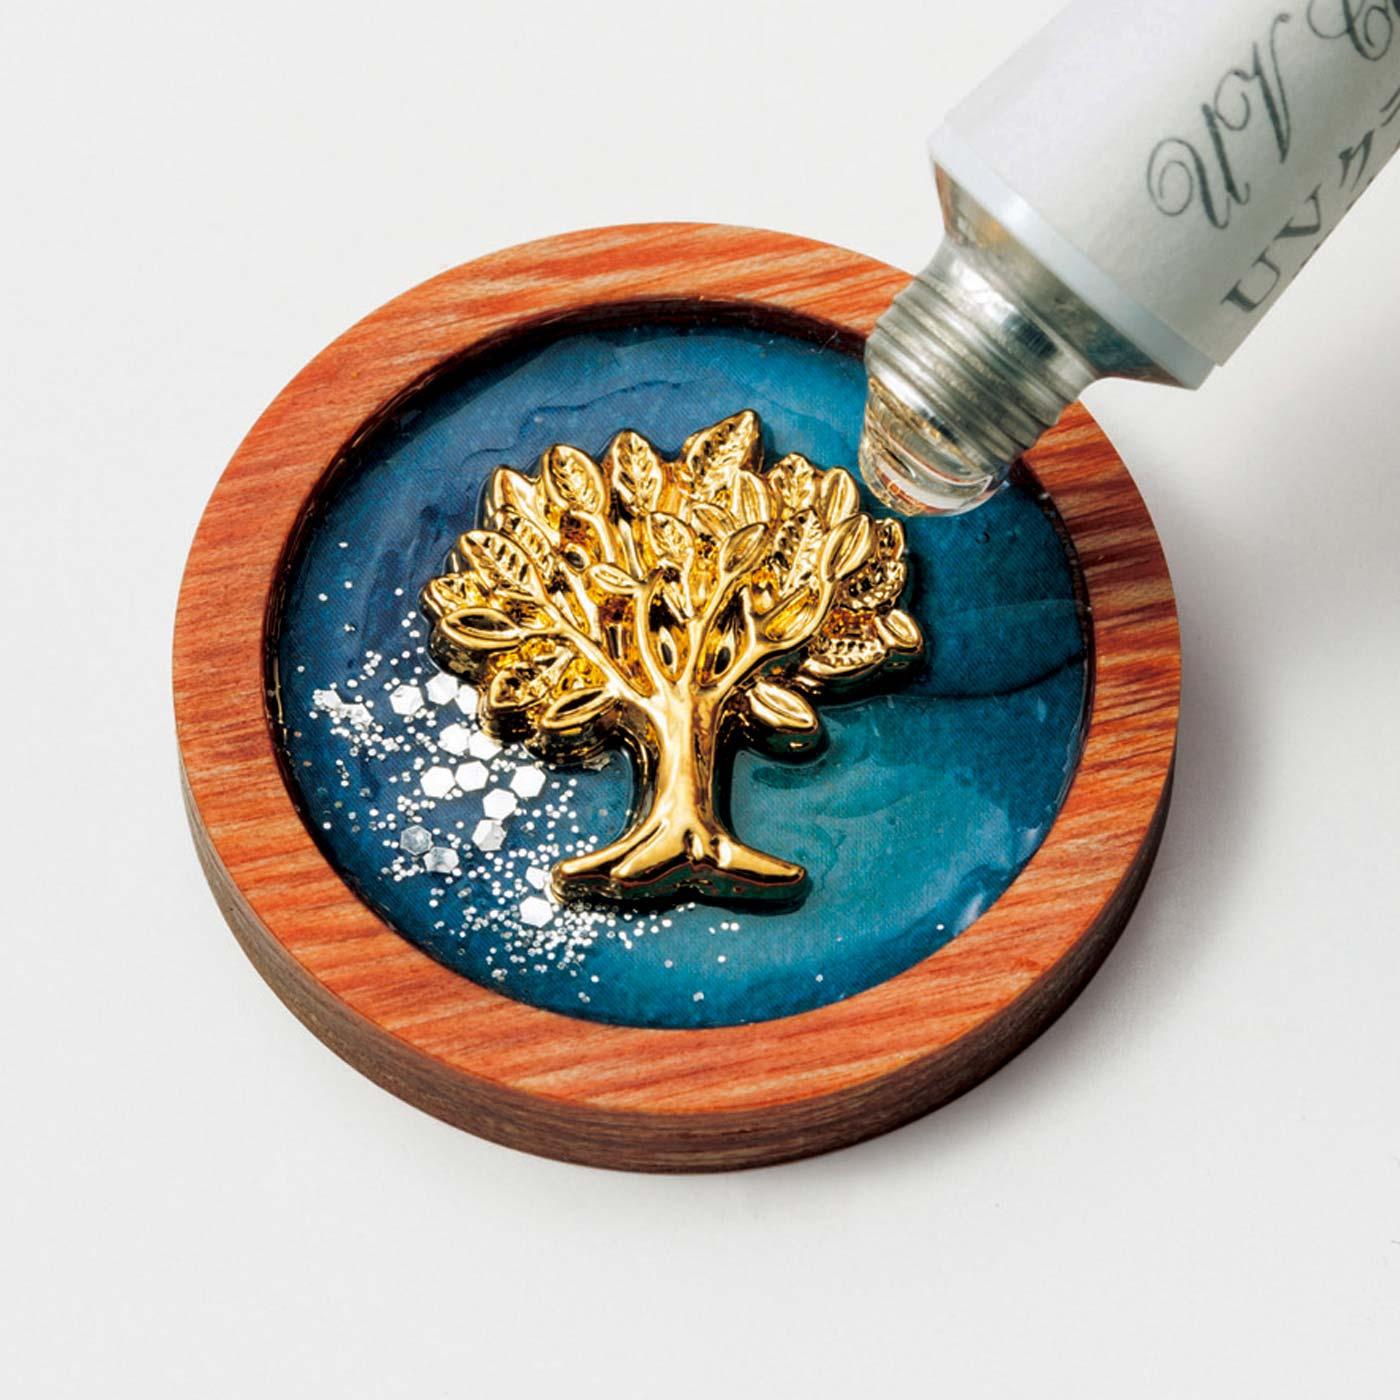 [UVレジンクラフト]人気の技法にチャレンジ。ボタンみたいな木枠にチャームなどを配置してUVレジン液を流し込み、紫外線で固めると完成。